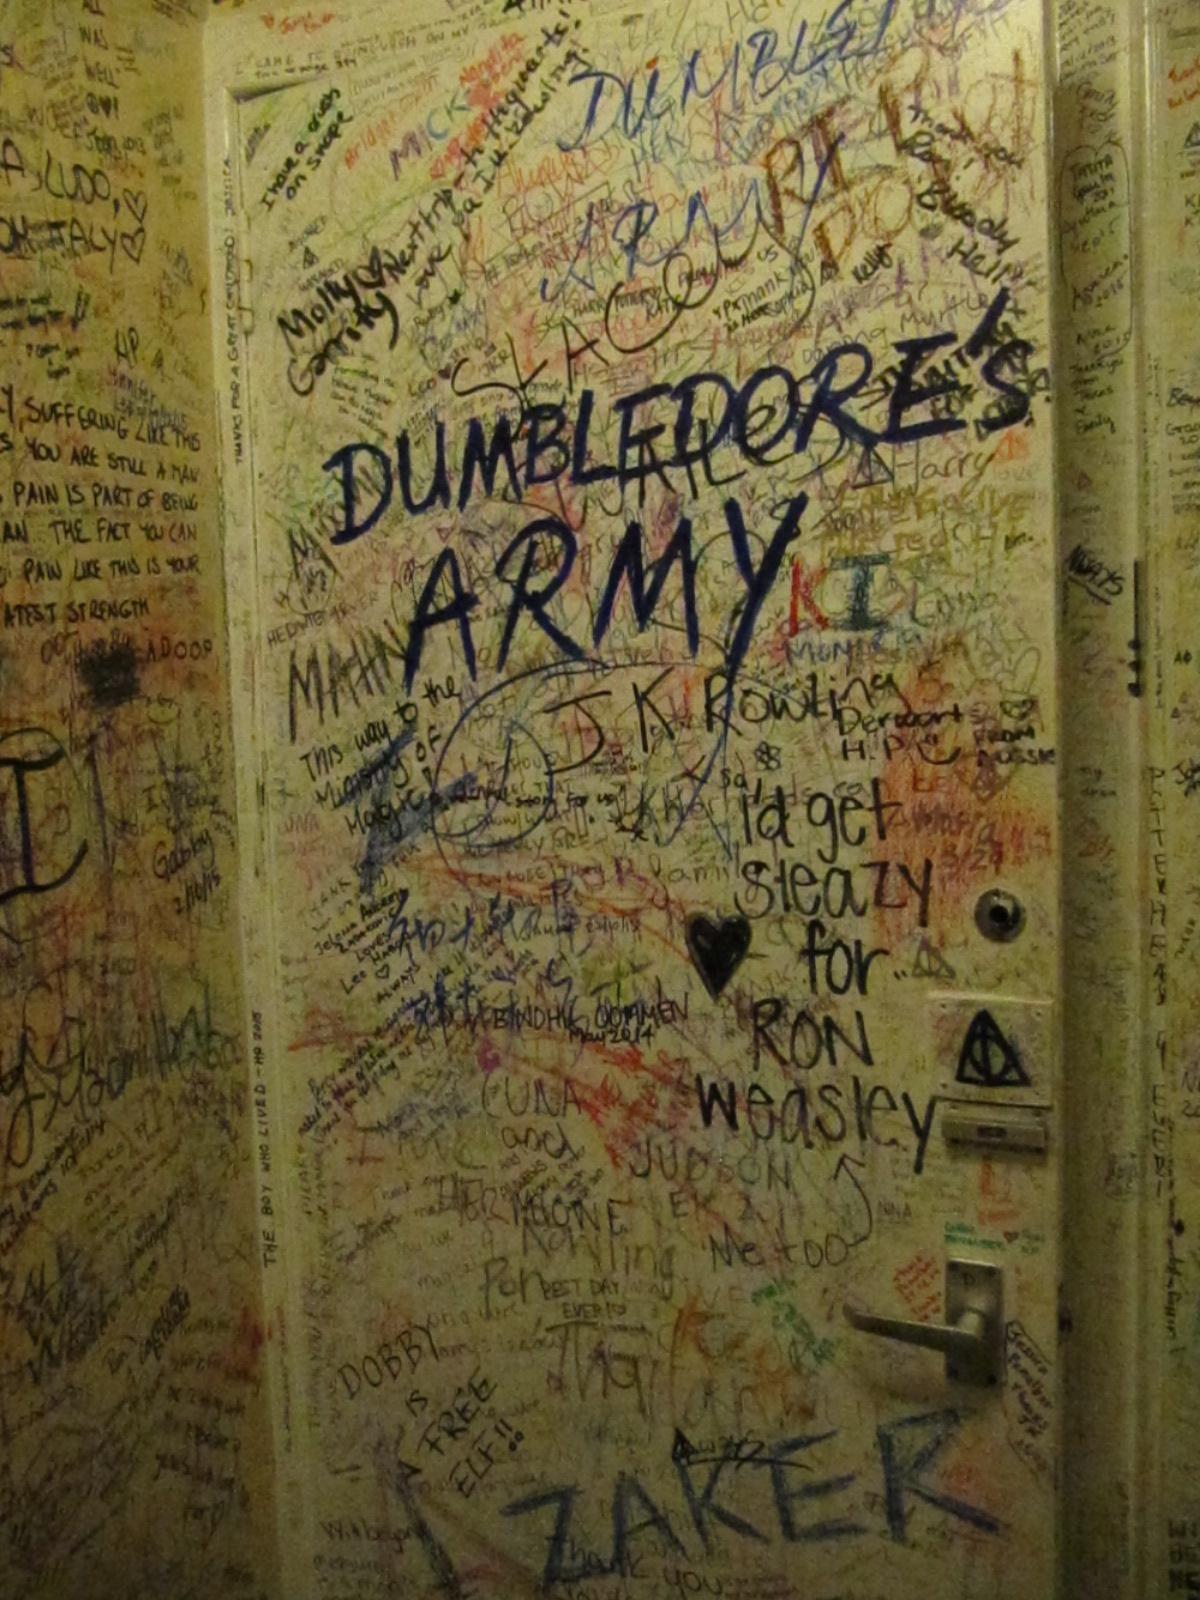 Dumbledore s army the elephant house bathroom elephant house bathroom shrine to harry potter